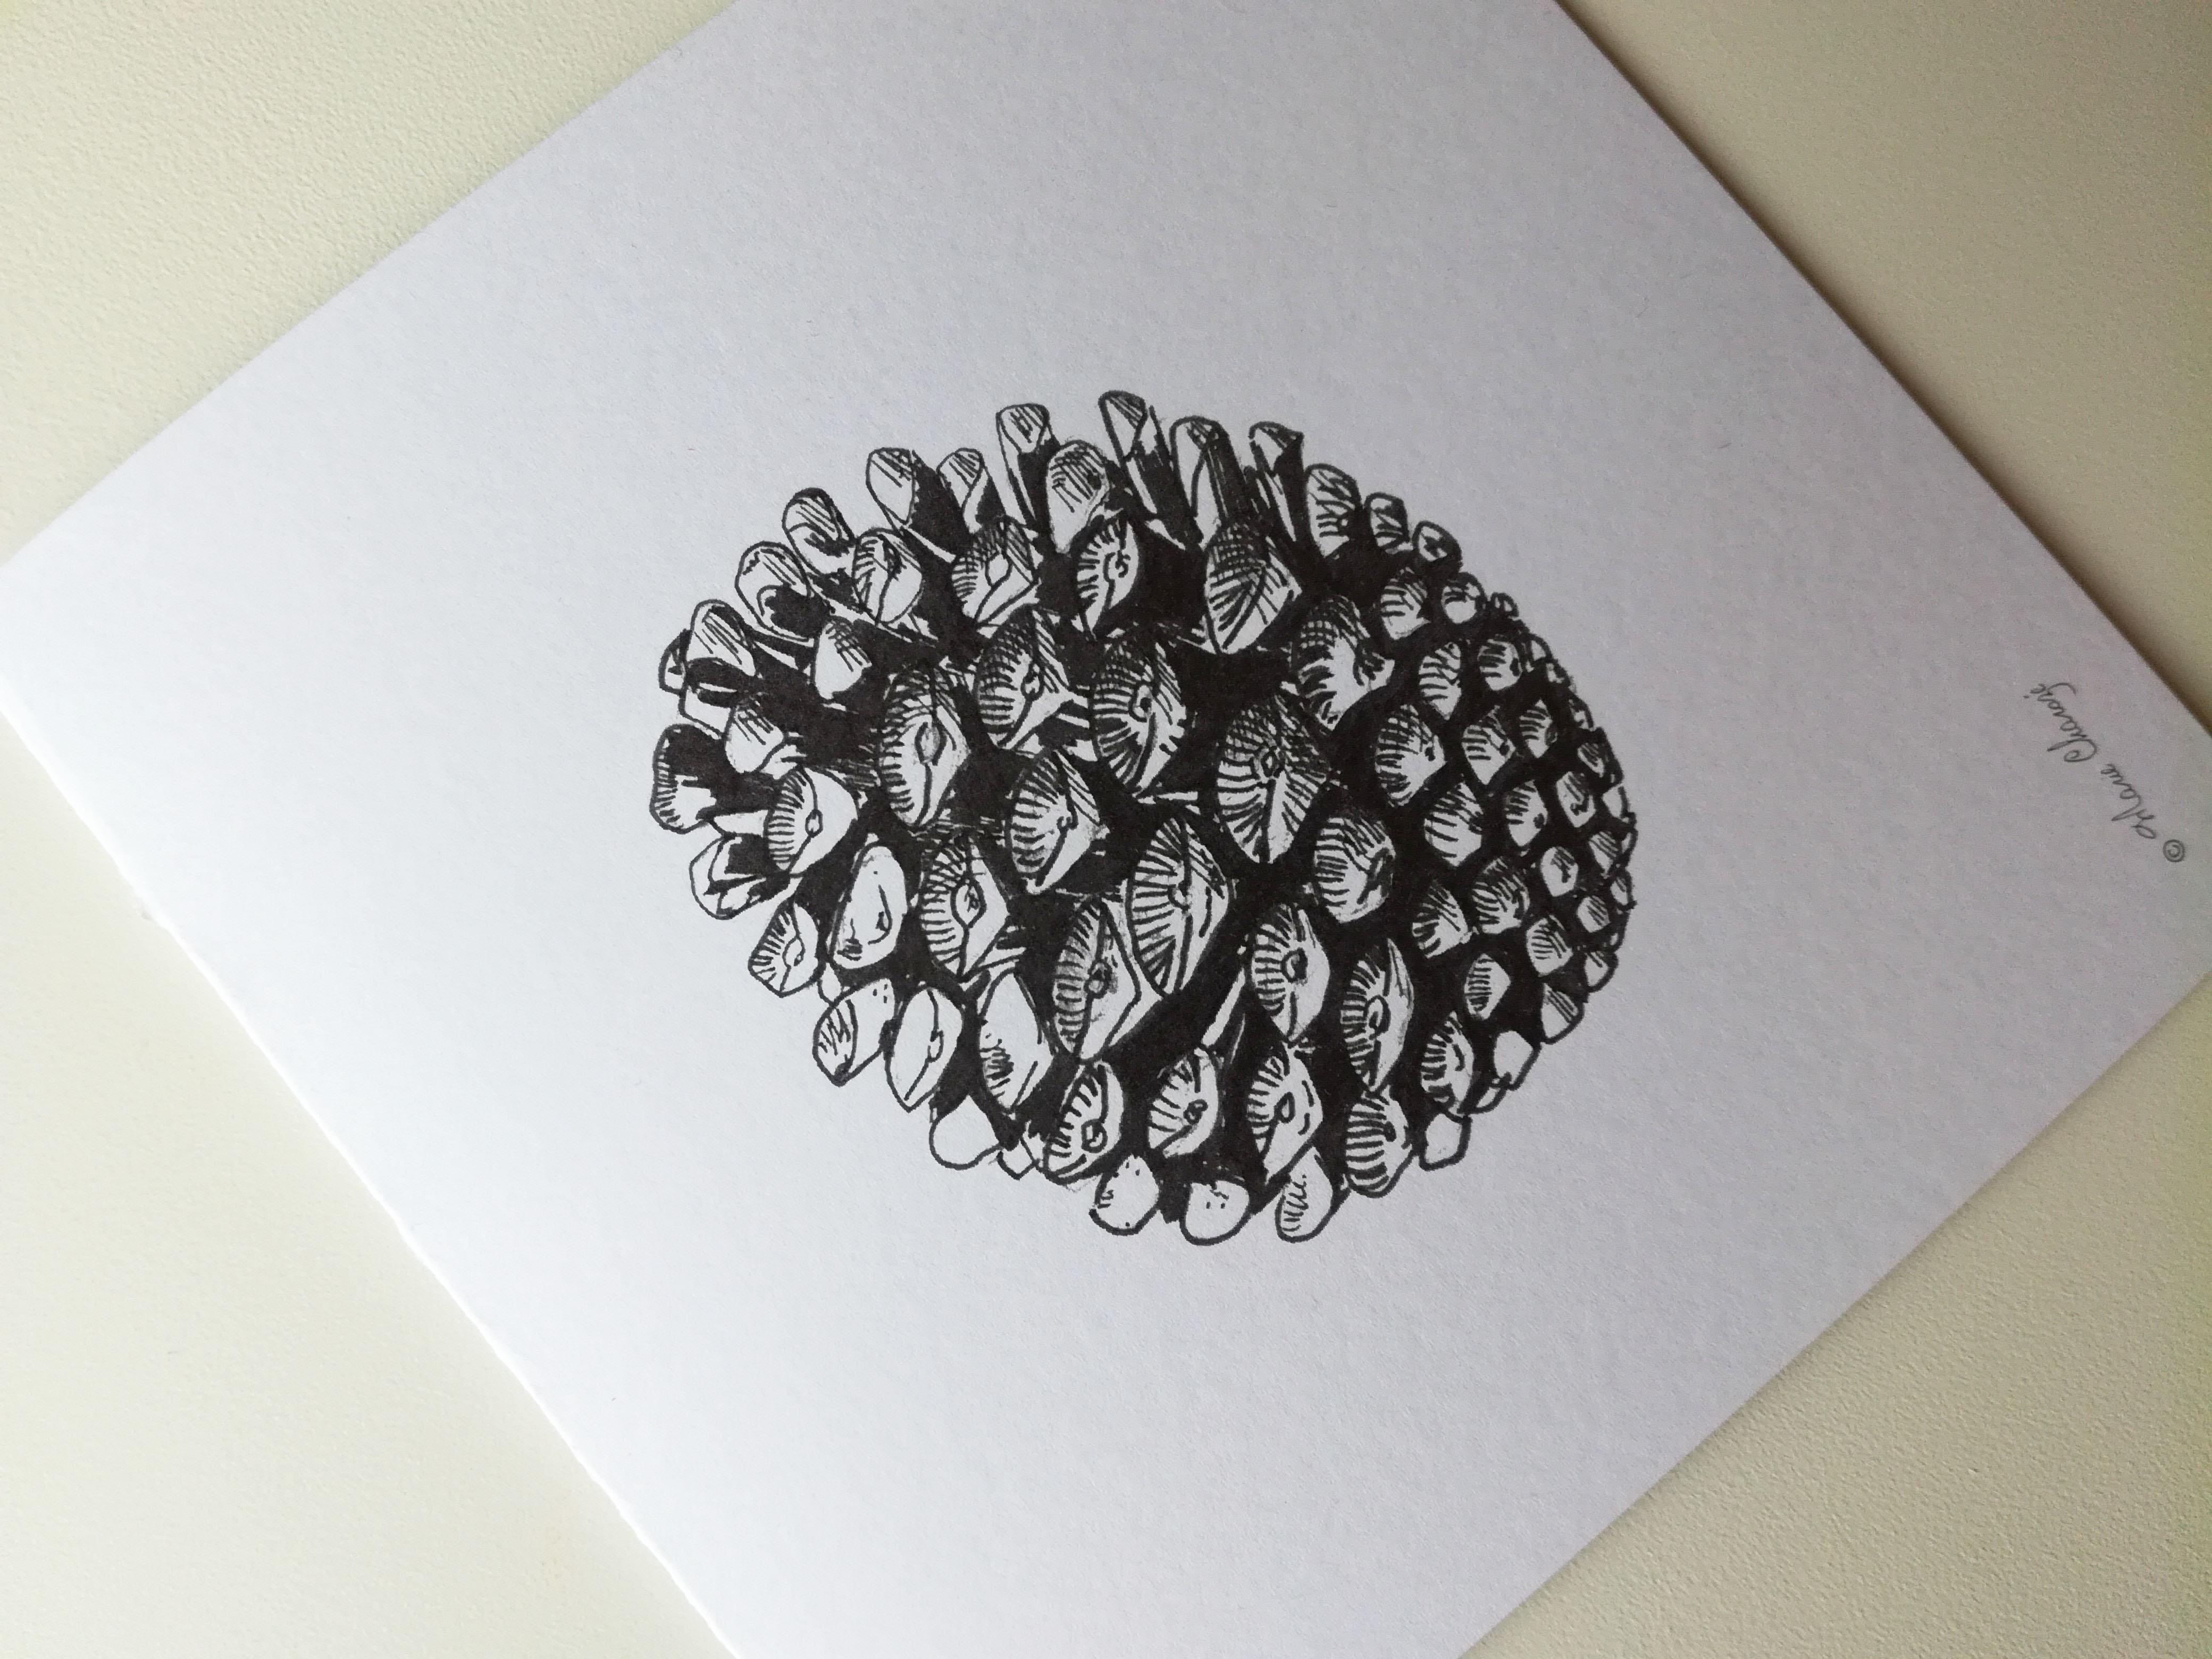 0513 Pomme de pin ro